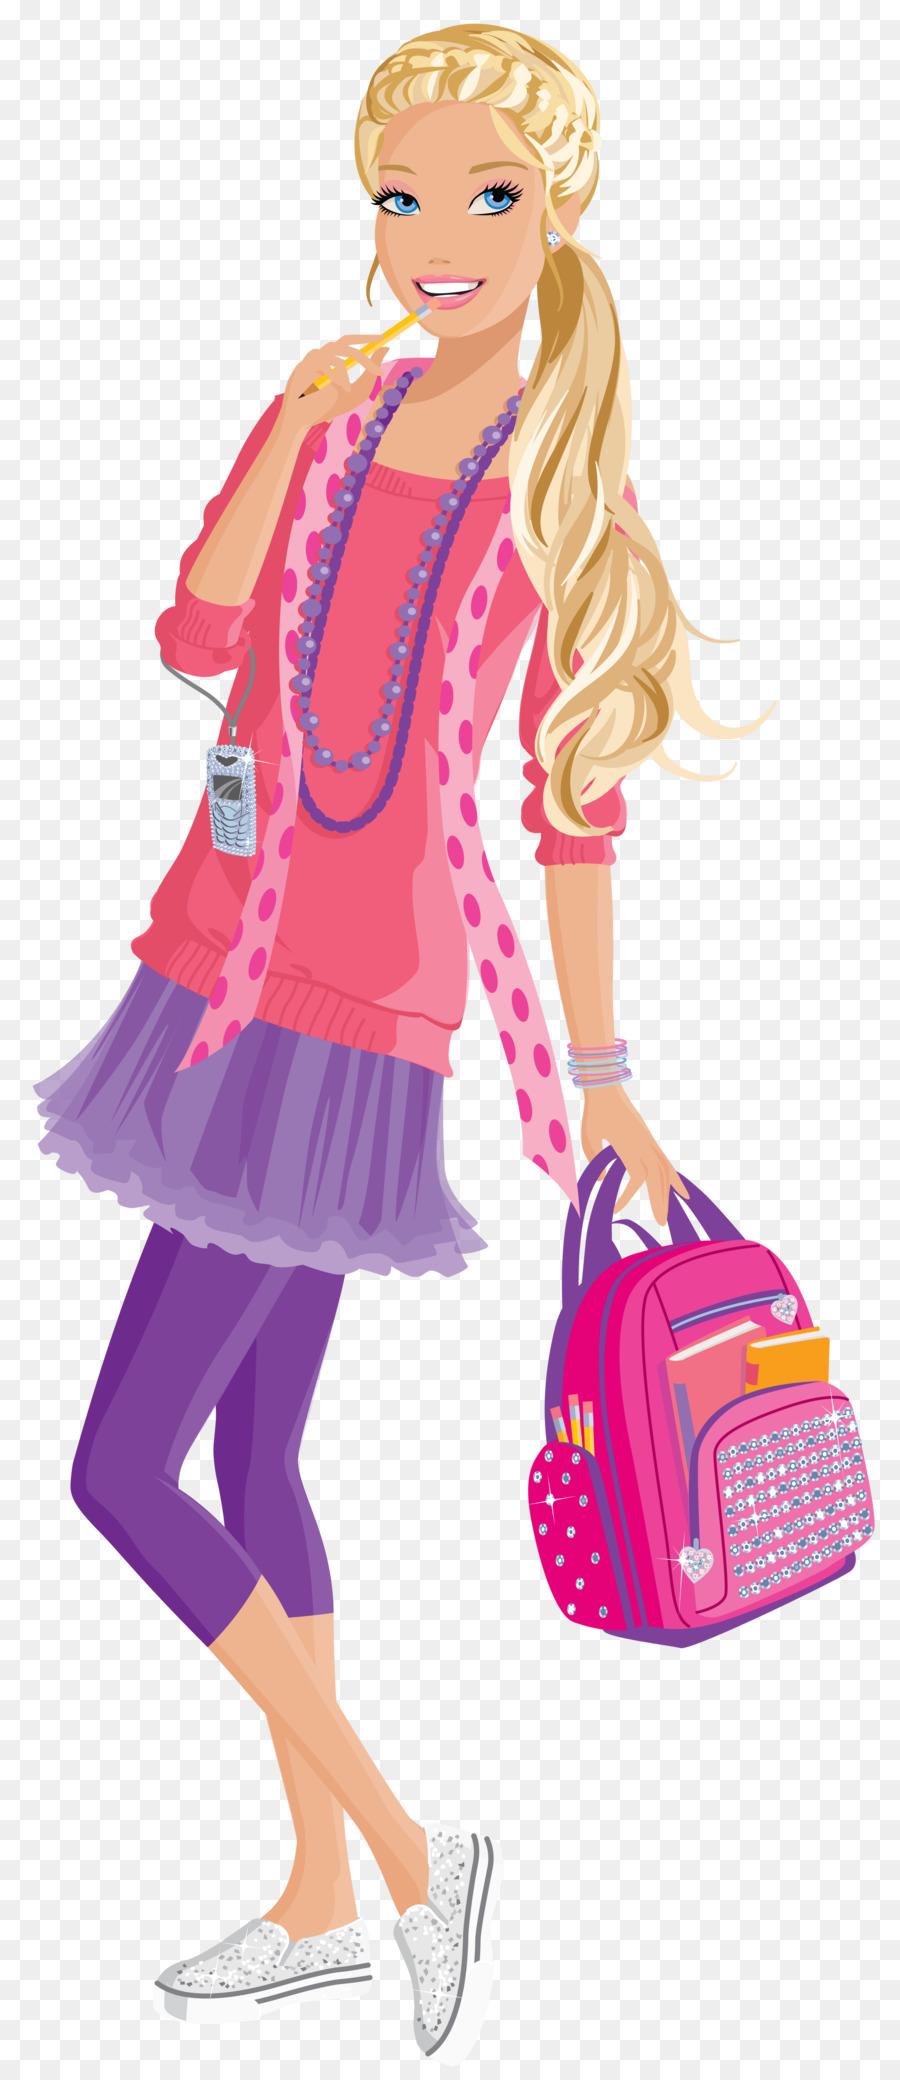 The princess popstar doll. Barbie clipart word